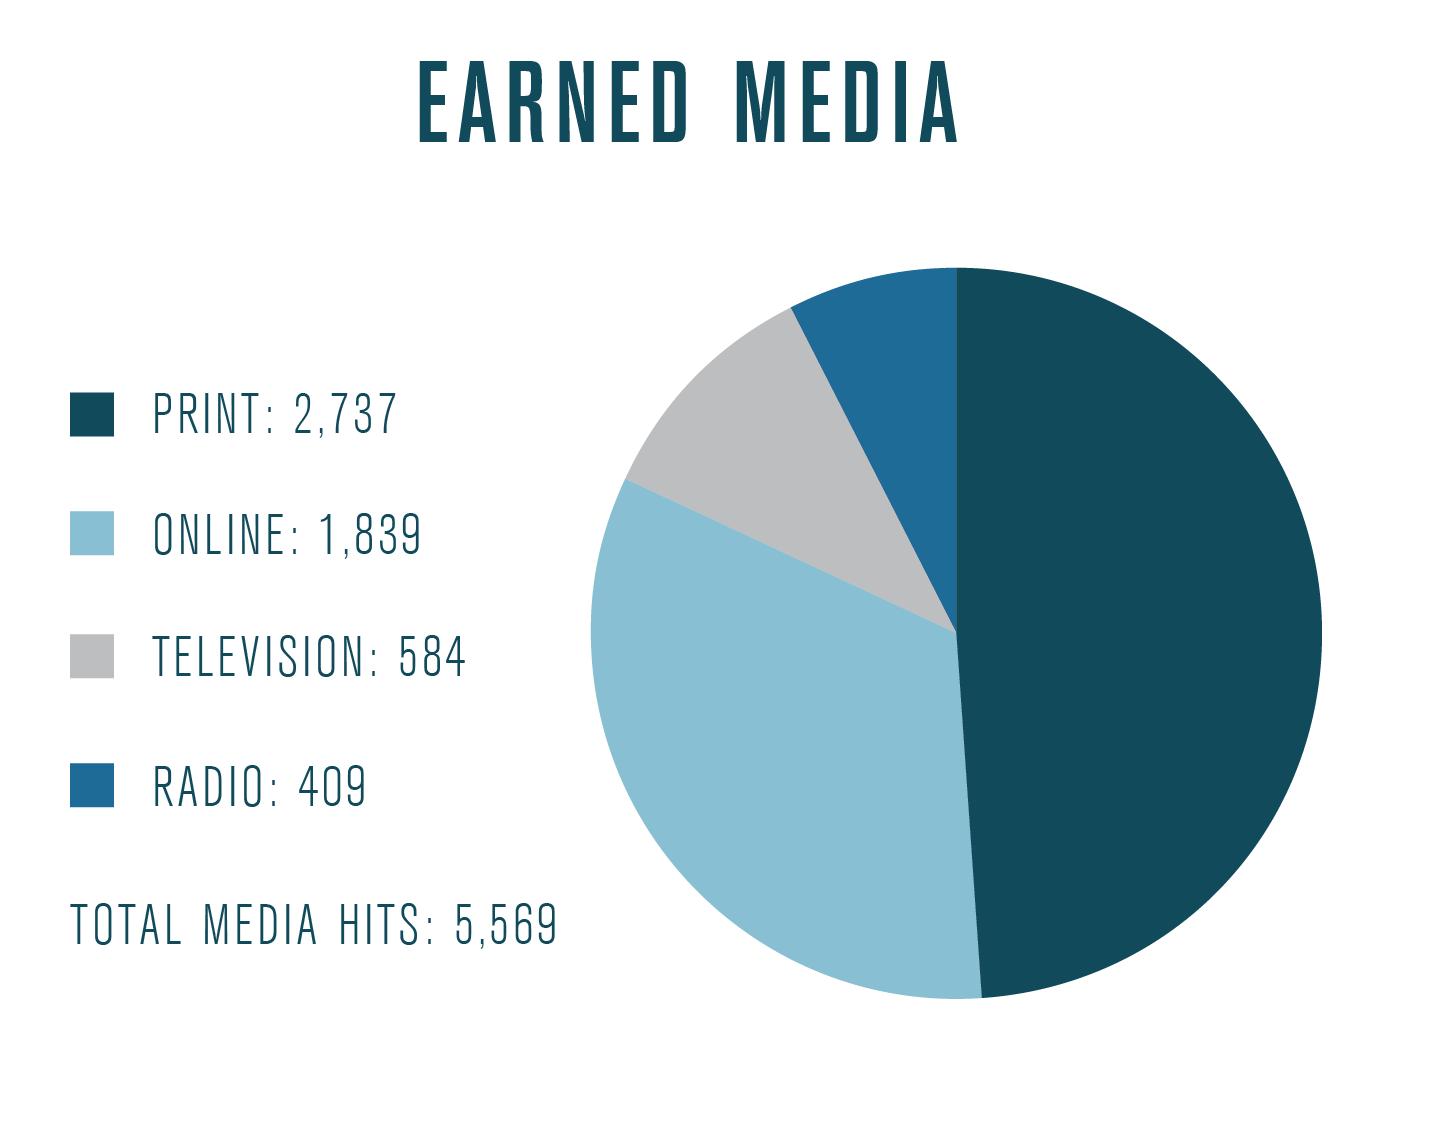 Media pie chart_3 copy 3